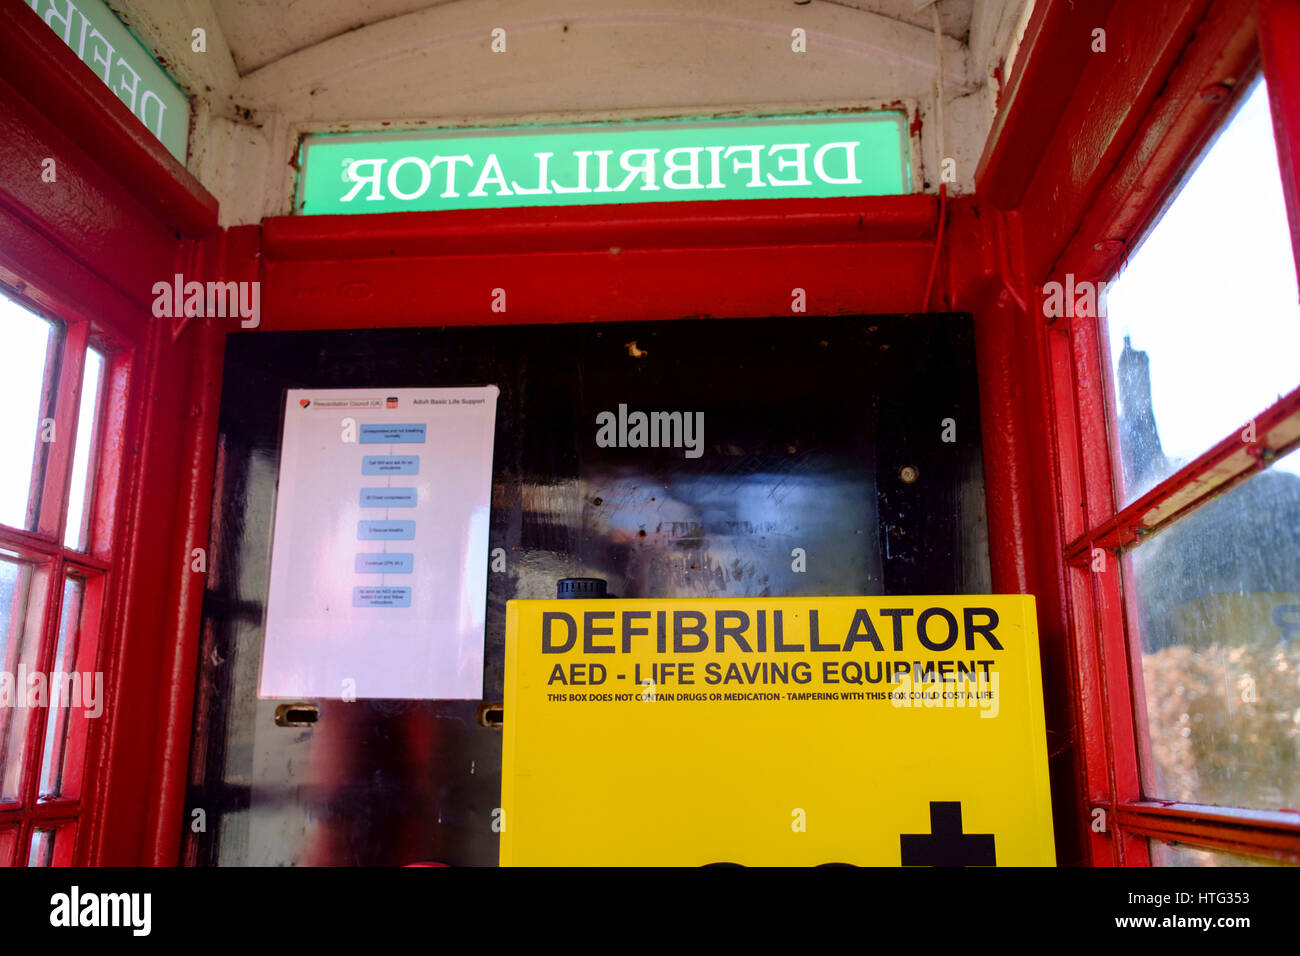 Wellow a somerset village Near Bath England UK Defibrillator in old K6 telephone kiosk - Stock Image